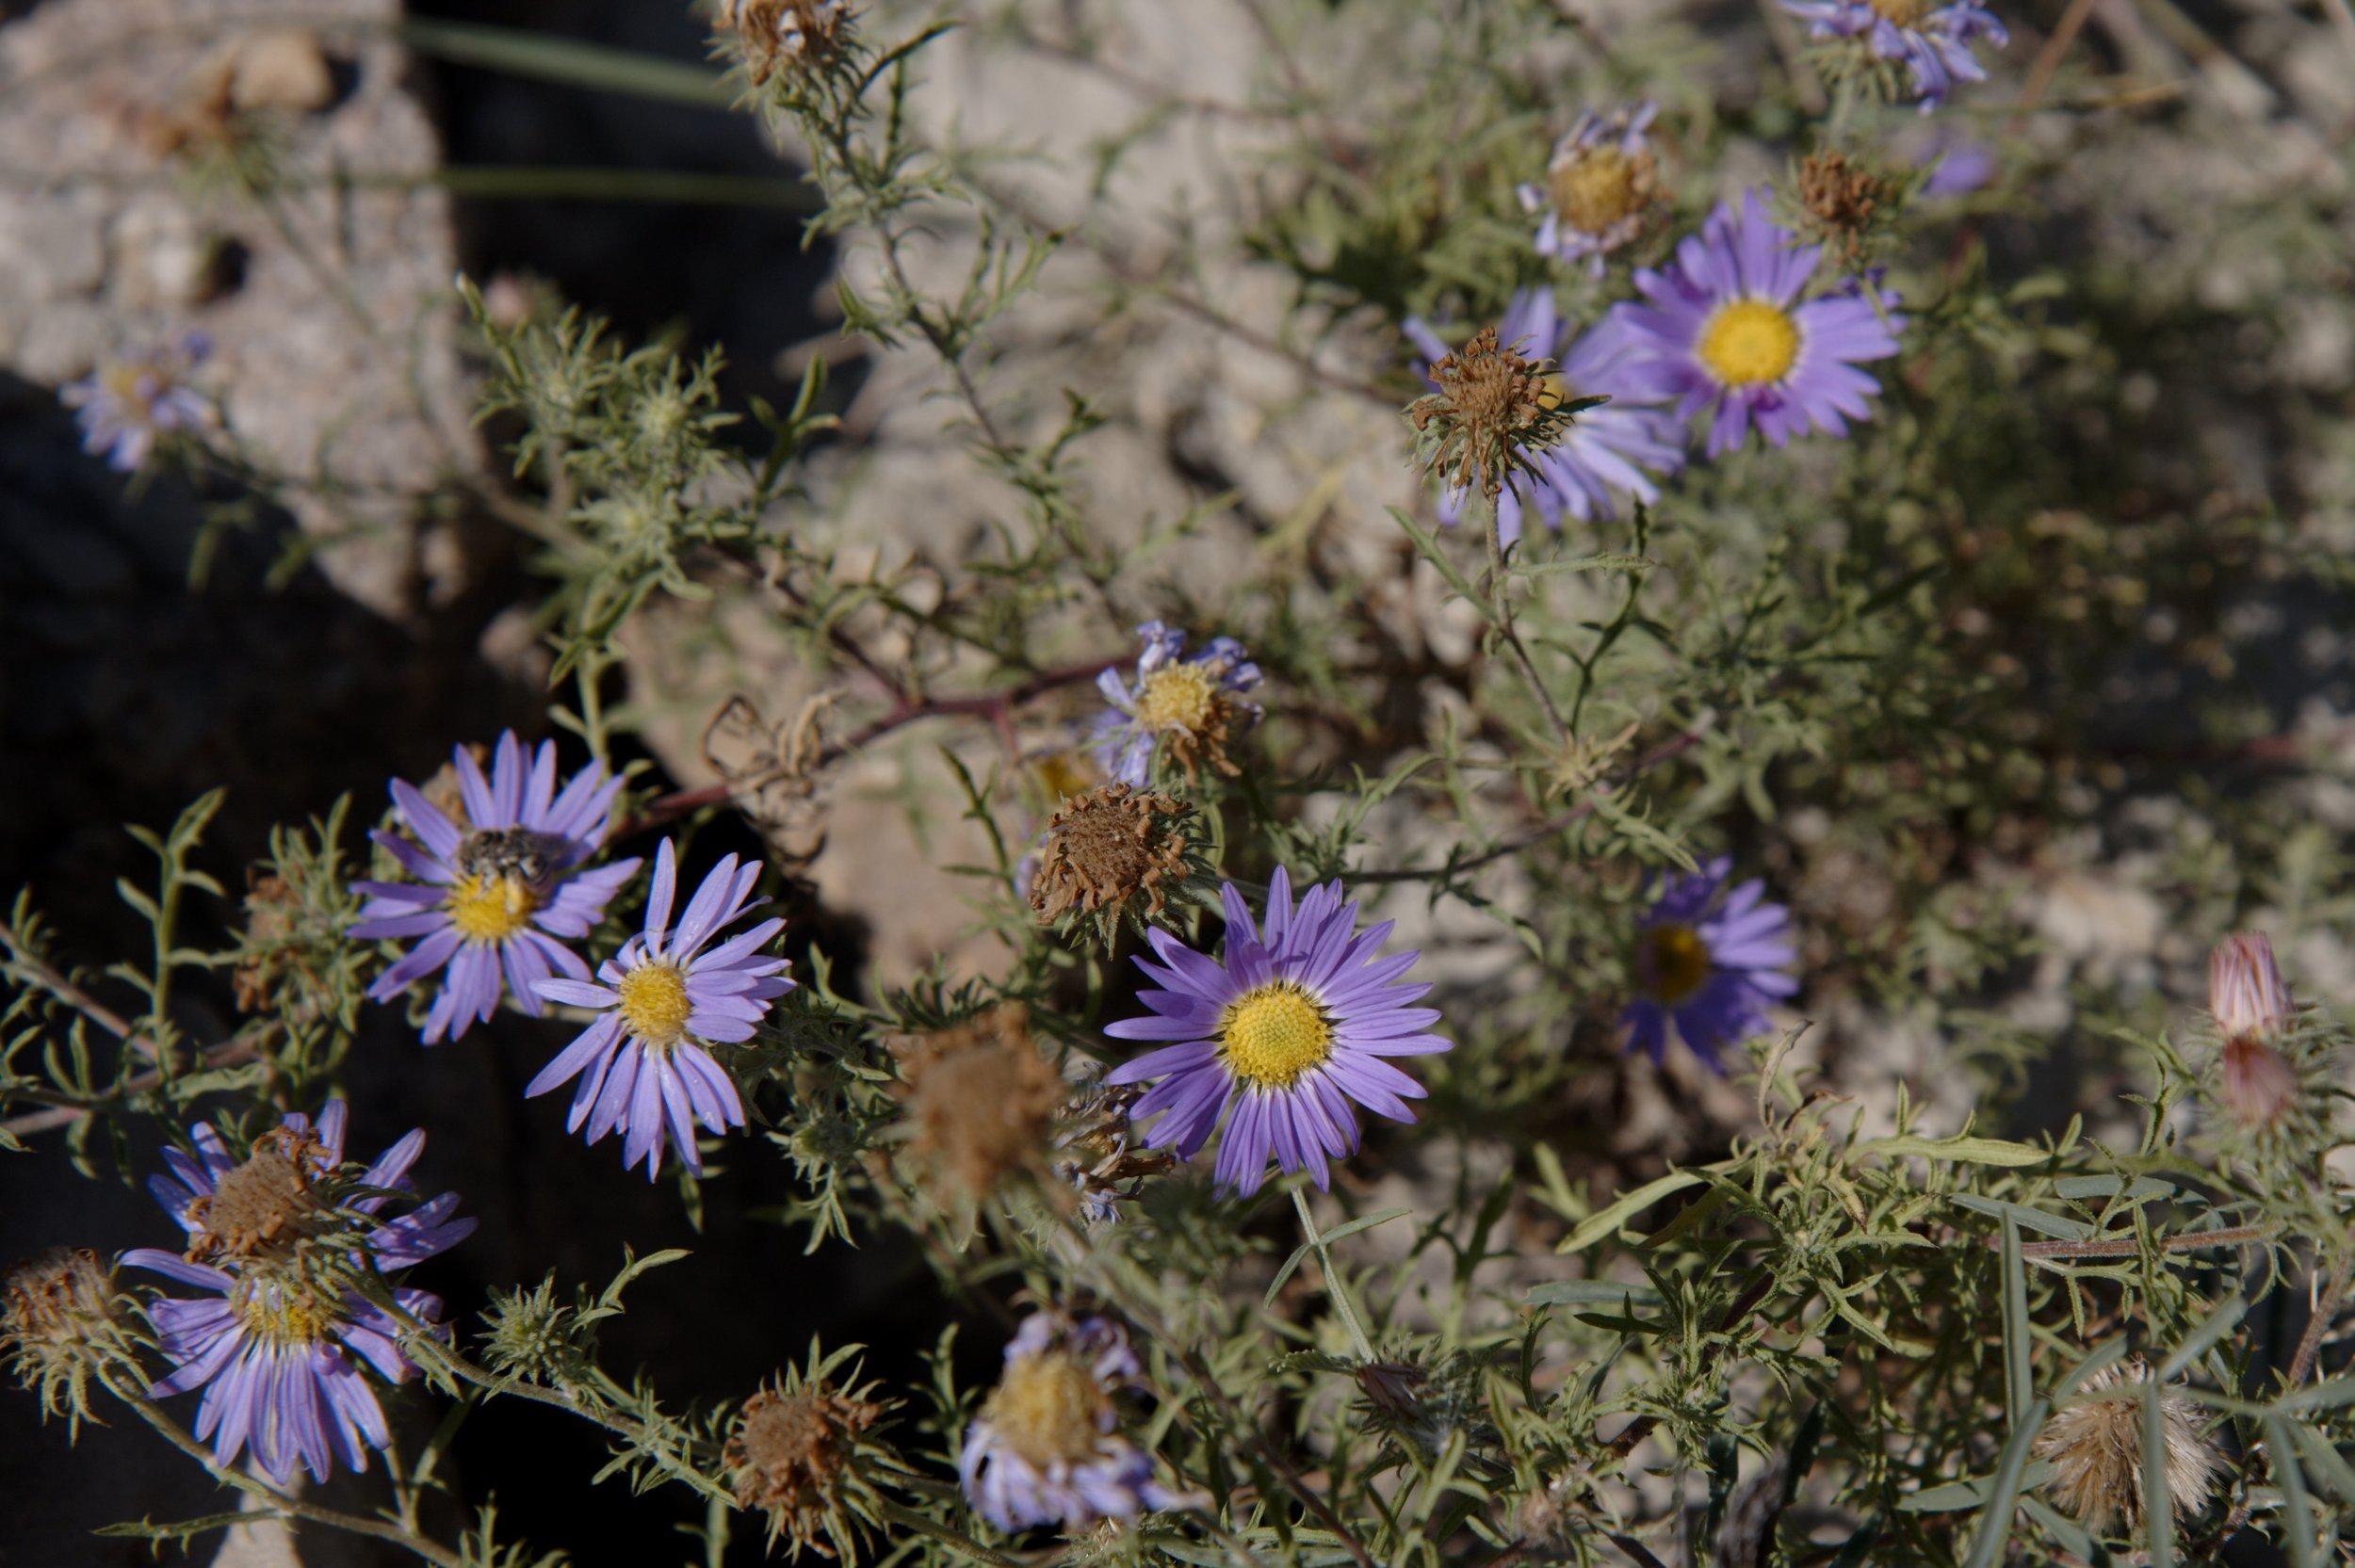 Takhoka Daisy(Machaeranthera tanacetifolia) - Nectar plant. Larval food plant for several butterfly species including the Sagebrush Checkerspot (Chlosyne acastus).